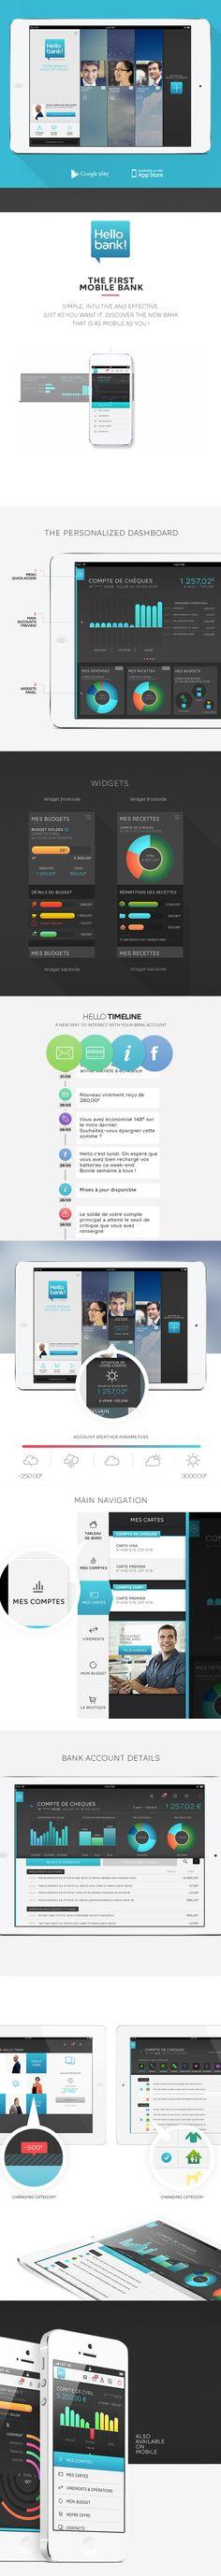 HELLO BANK! IPAD APP Art Direction, Interaction Design, UI/UX